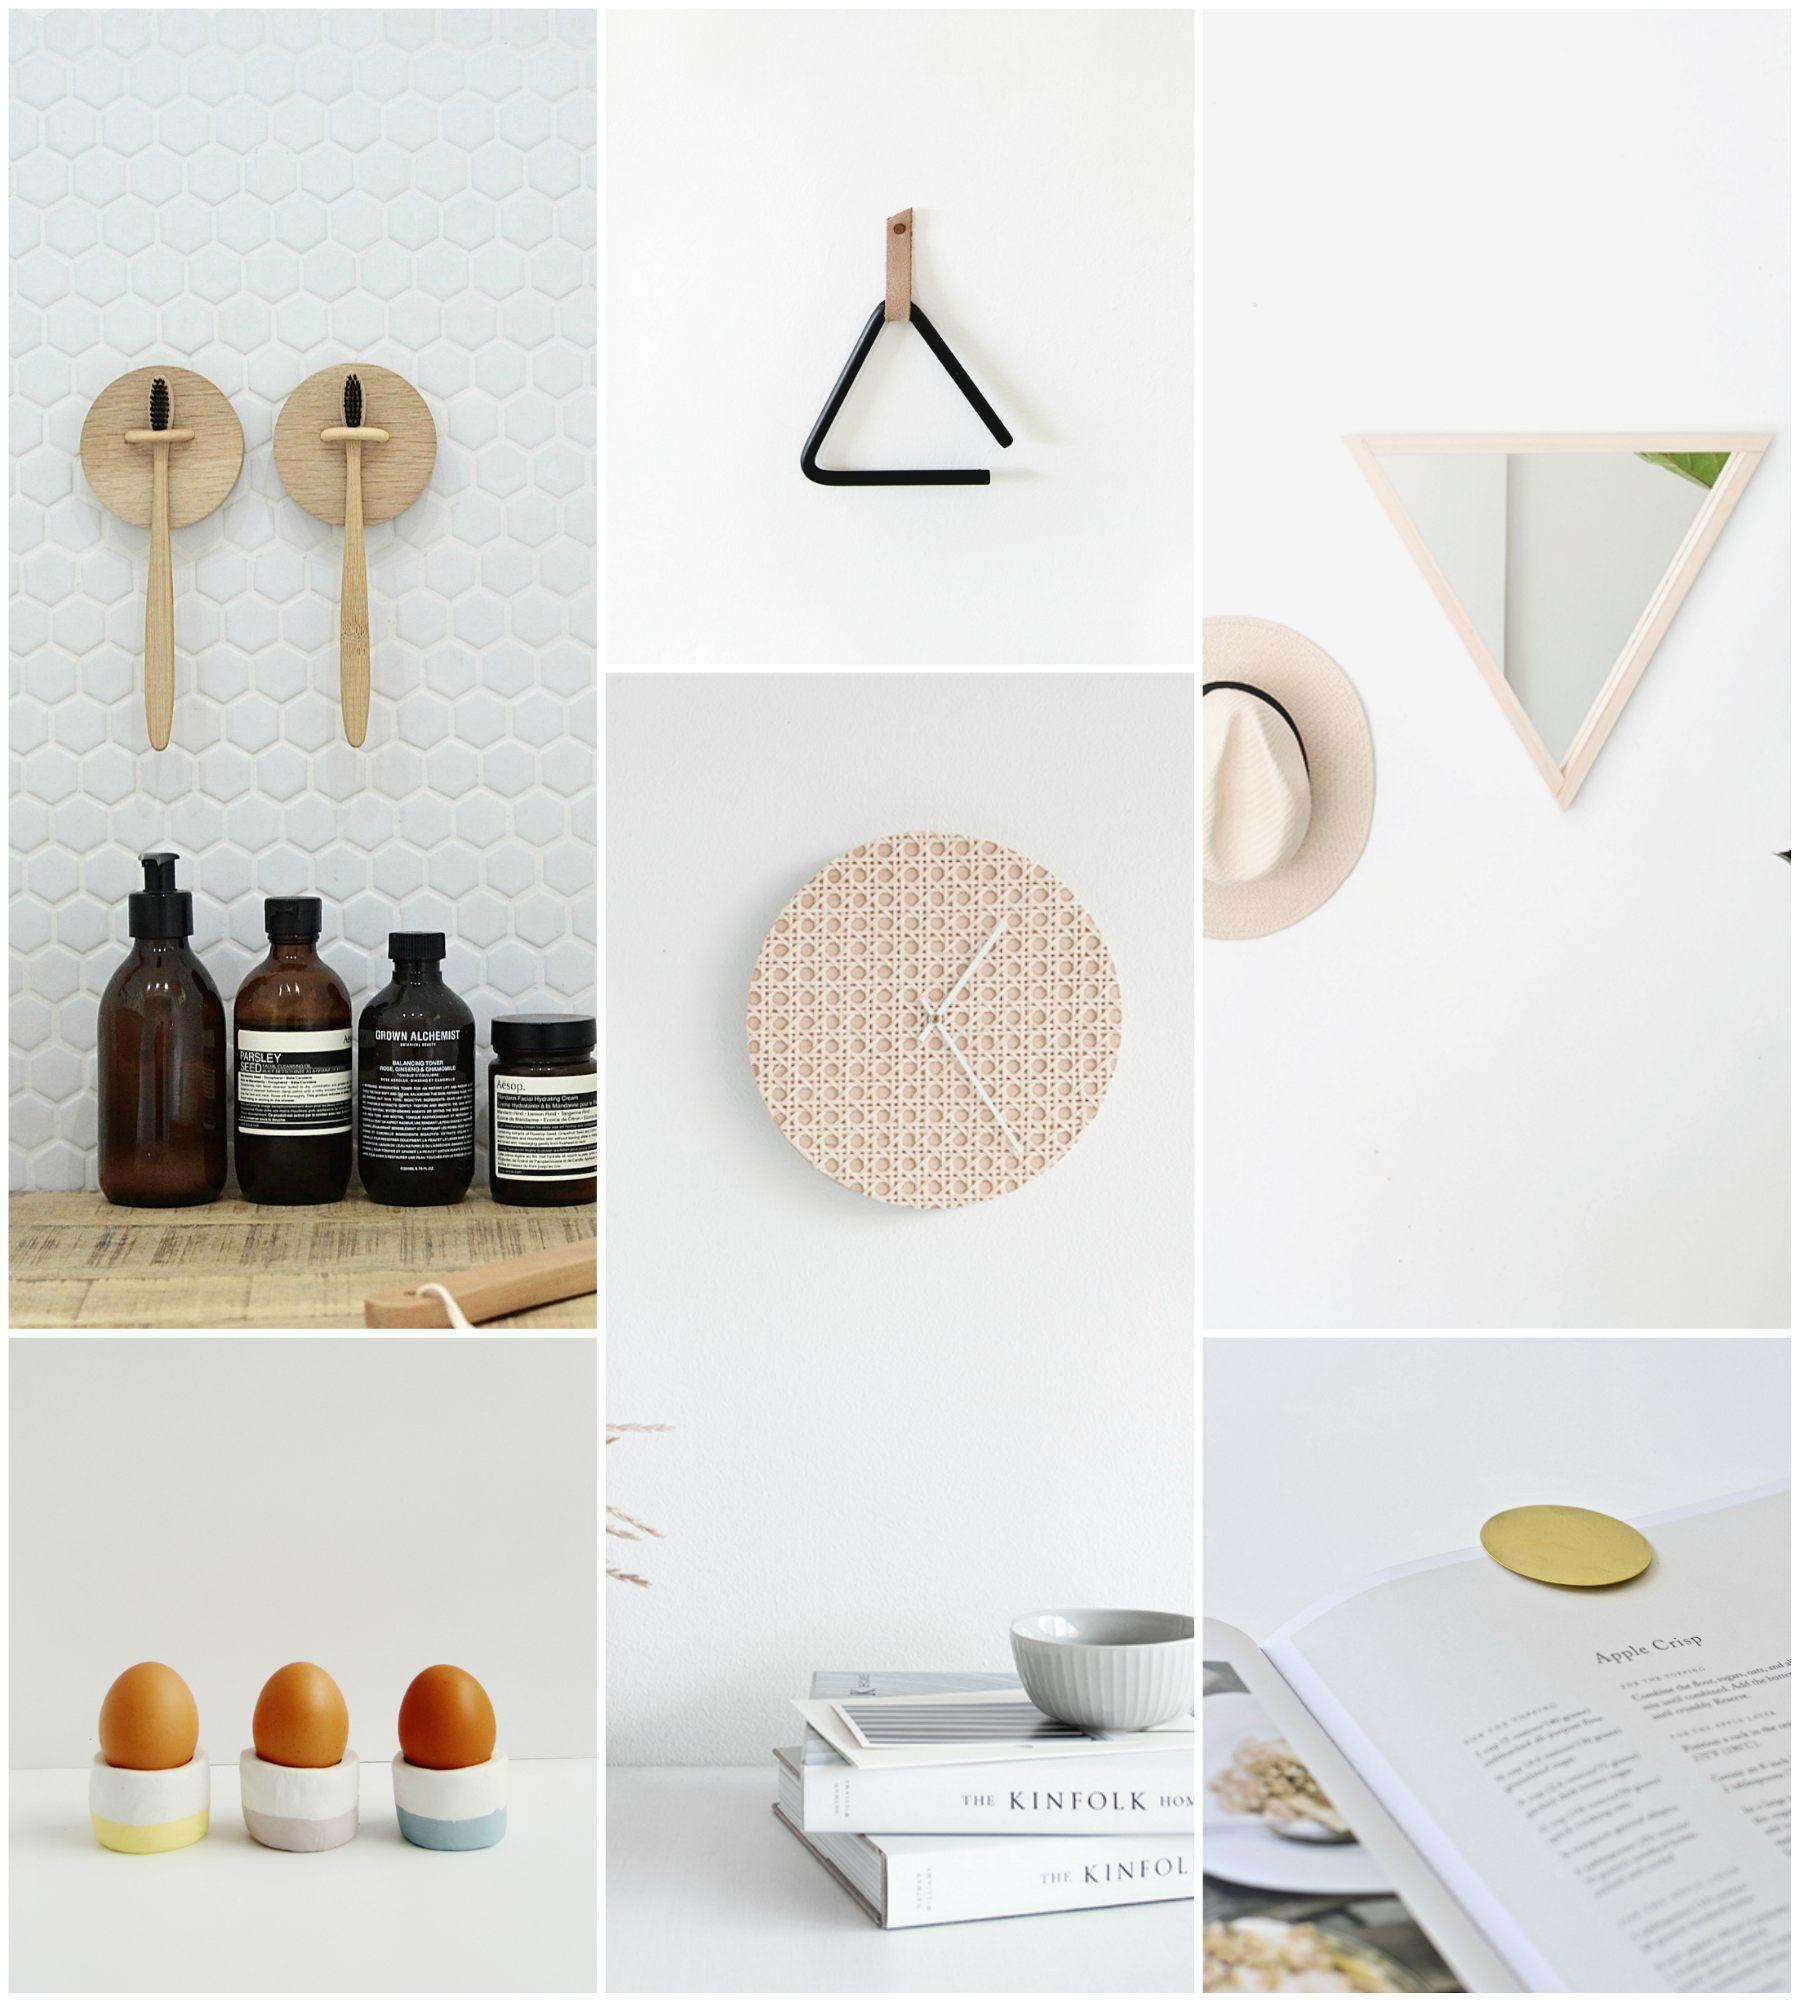 minimal and easy DIY home decor ideas